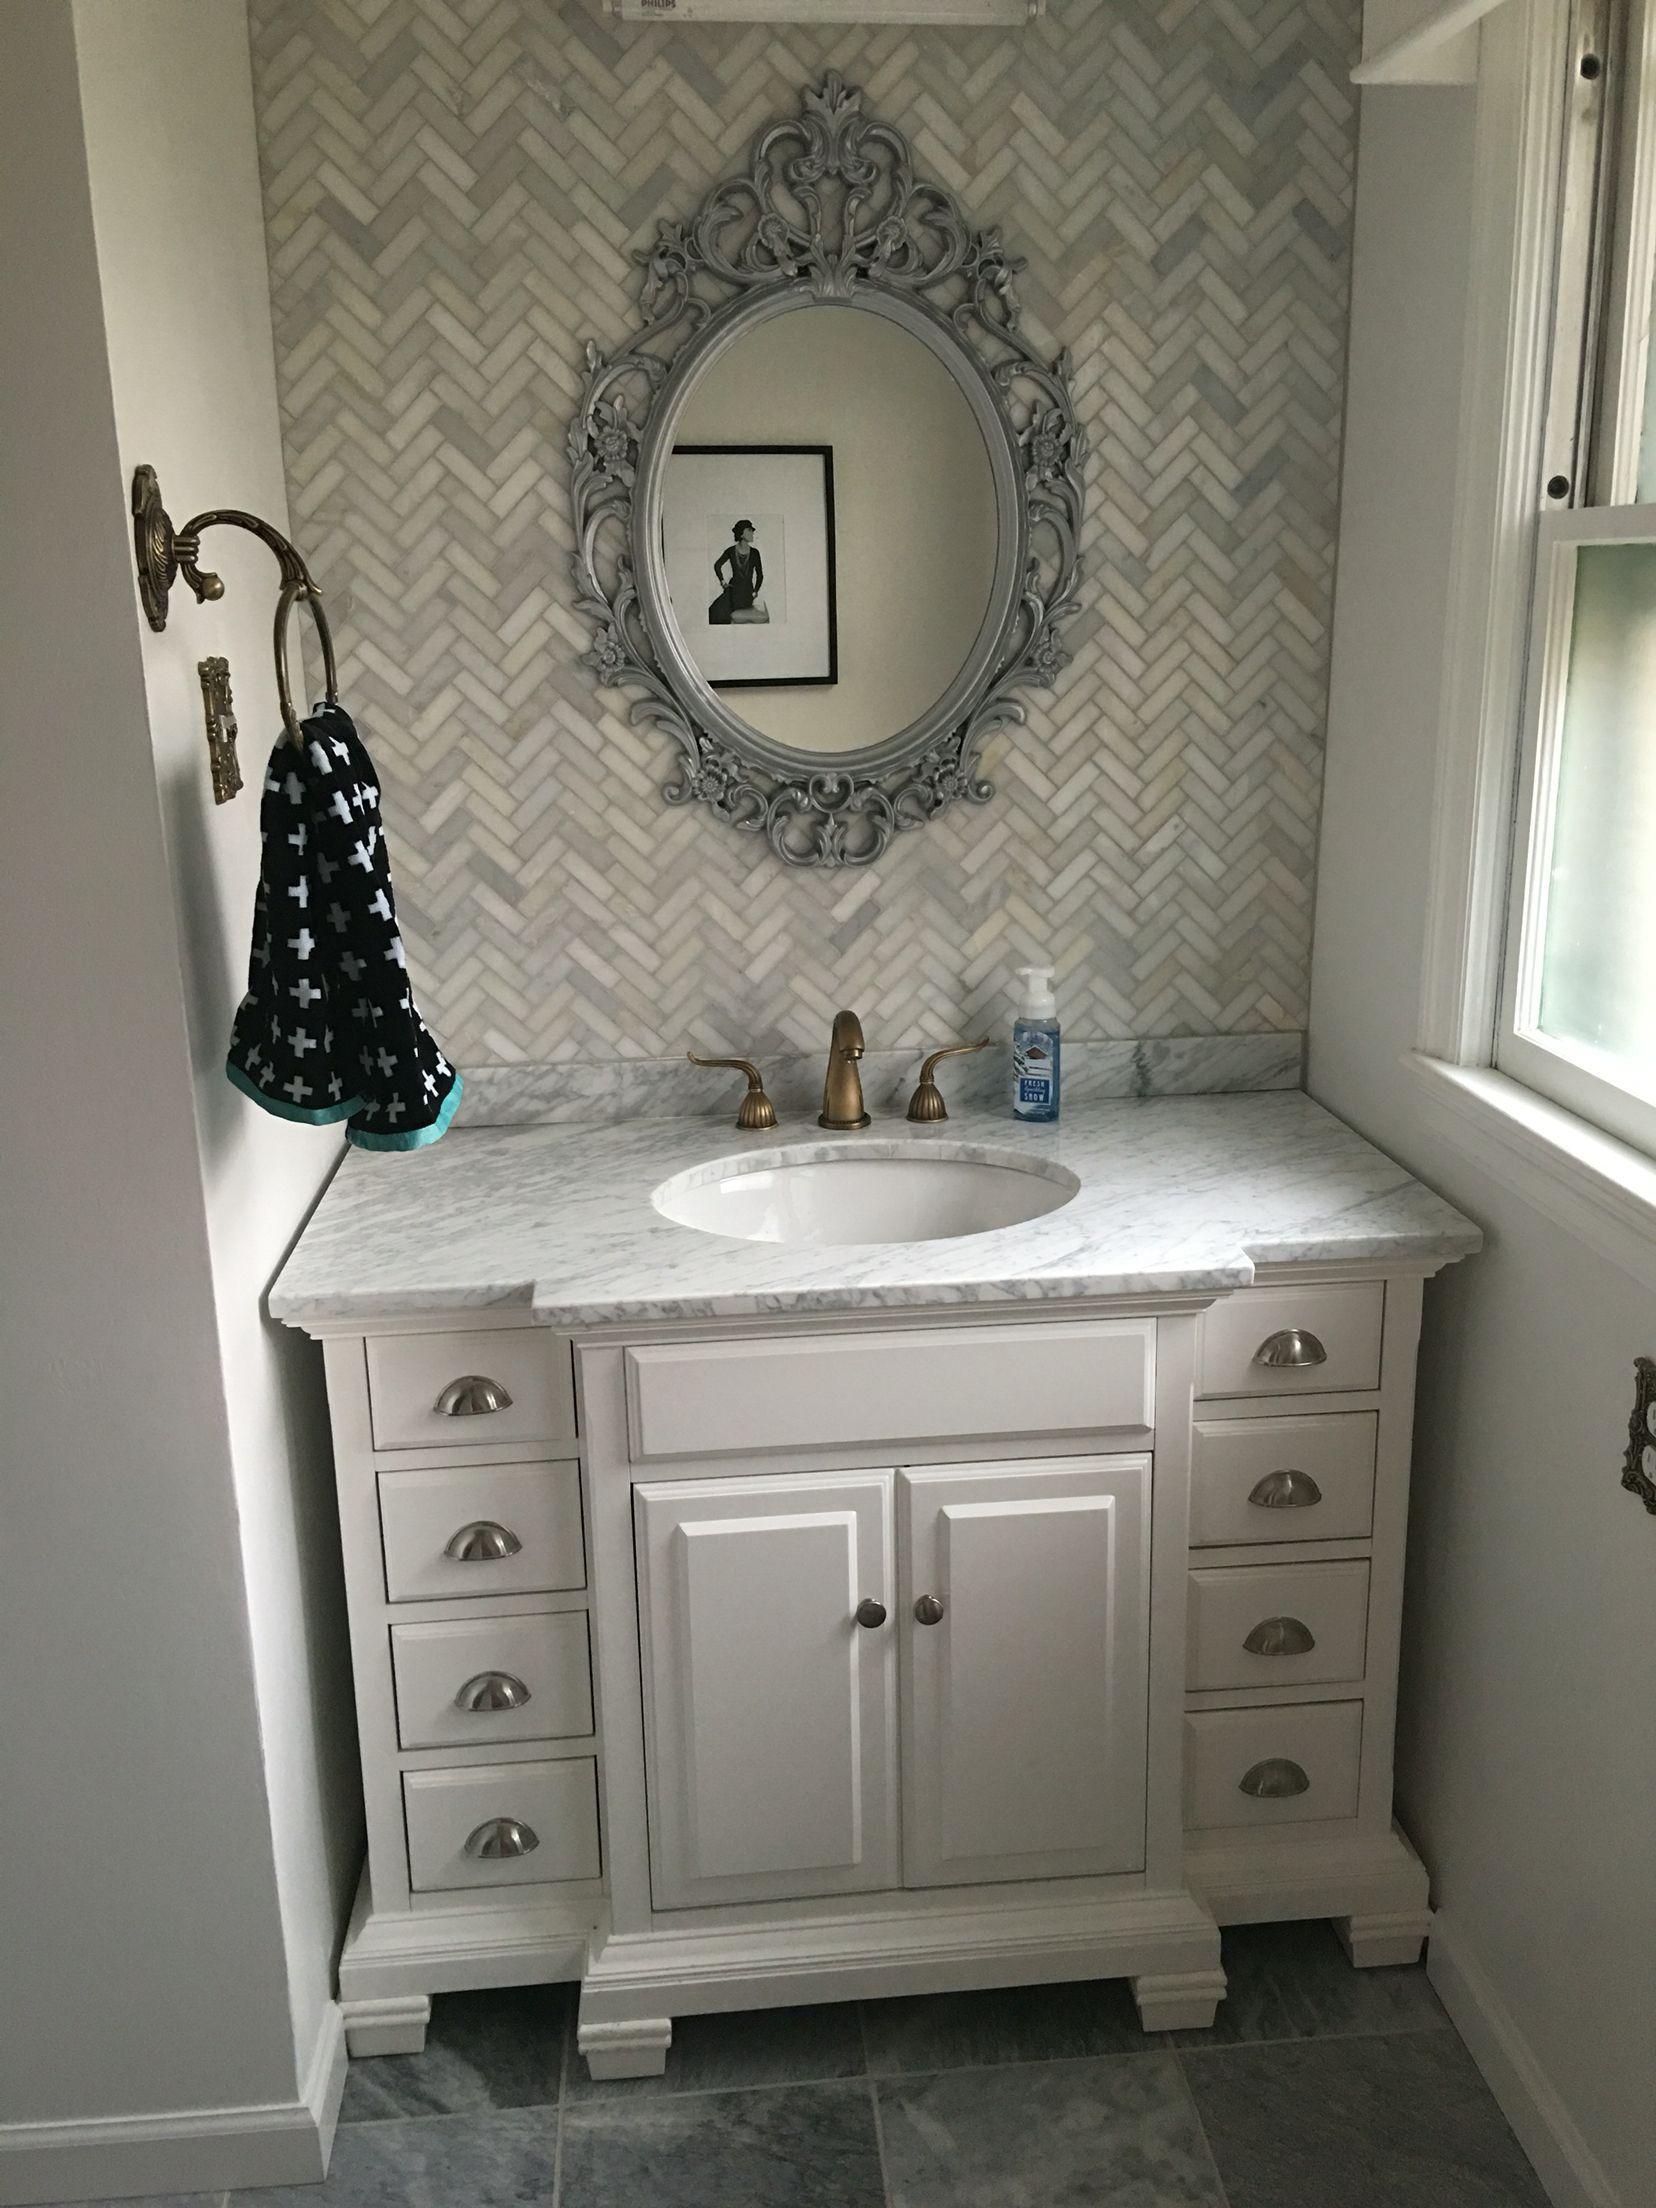 7 Interesting Bathroom Backsplash Ideas Design Ideas To Inspire